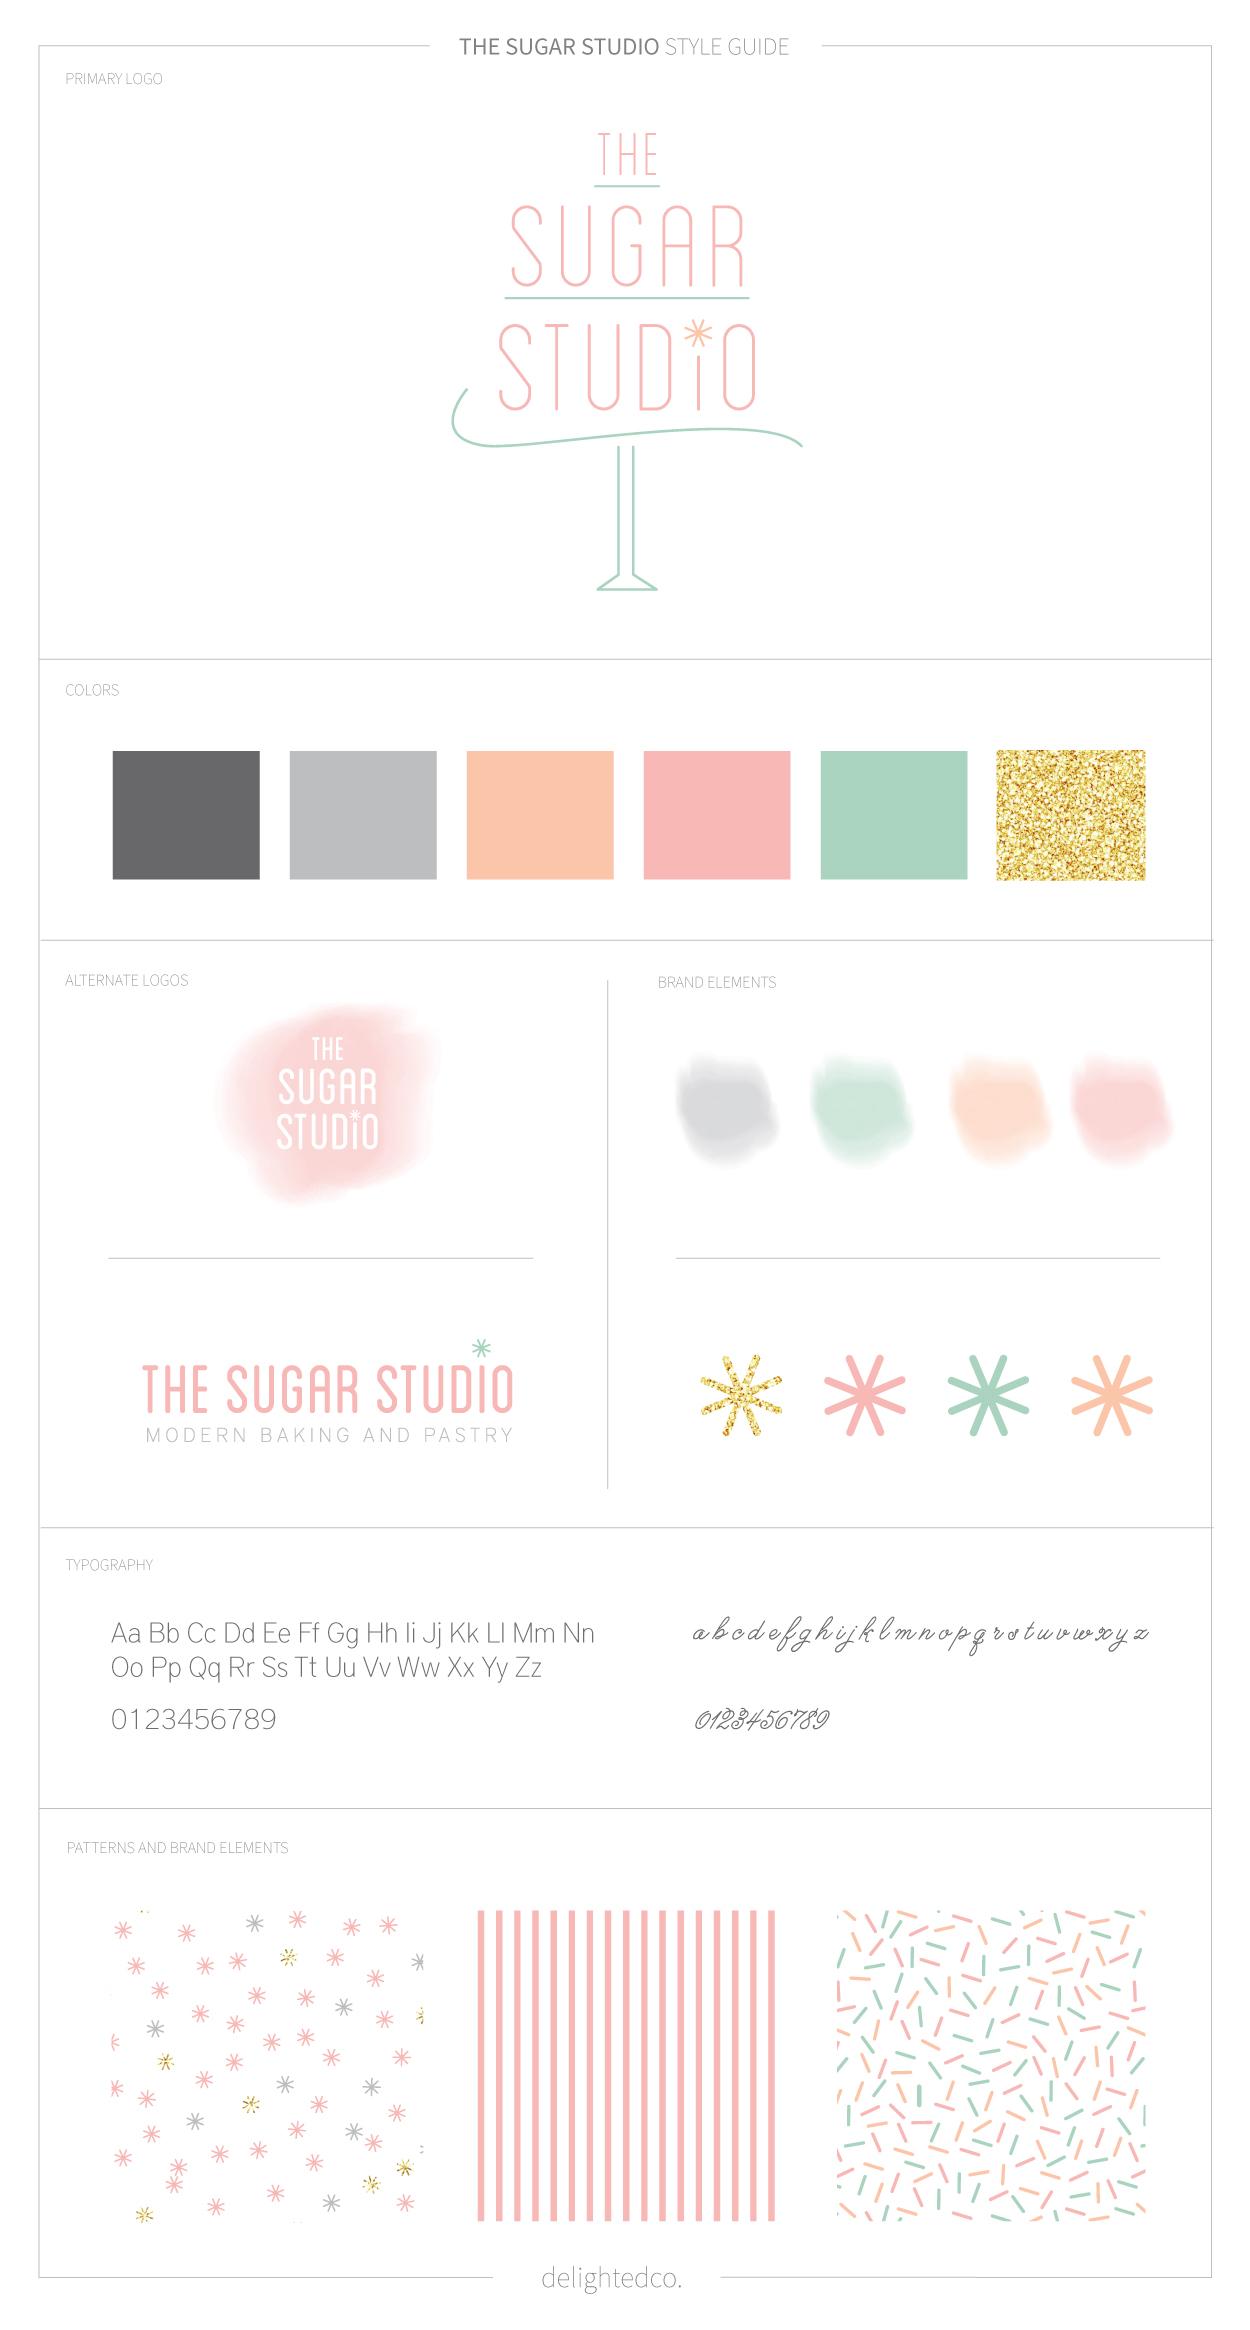 The Sugar Studio Brand Style Guide by DelightedCo.